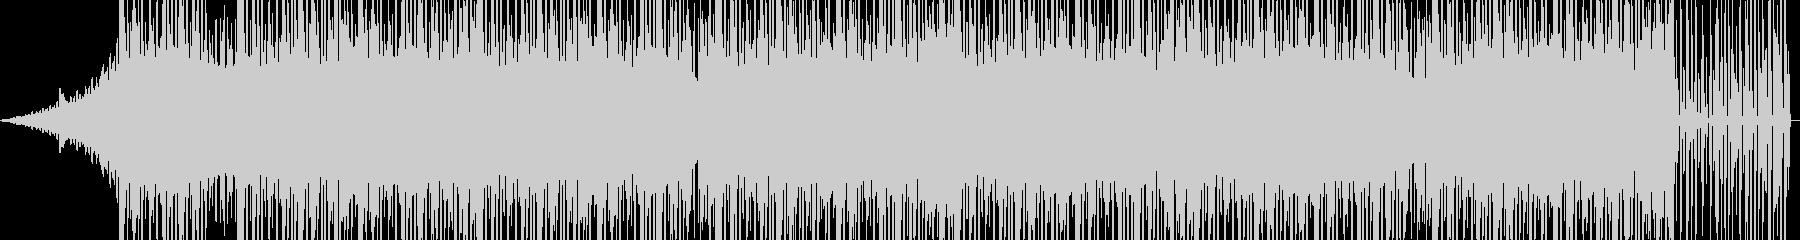 90s系ビートの未再生の波形